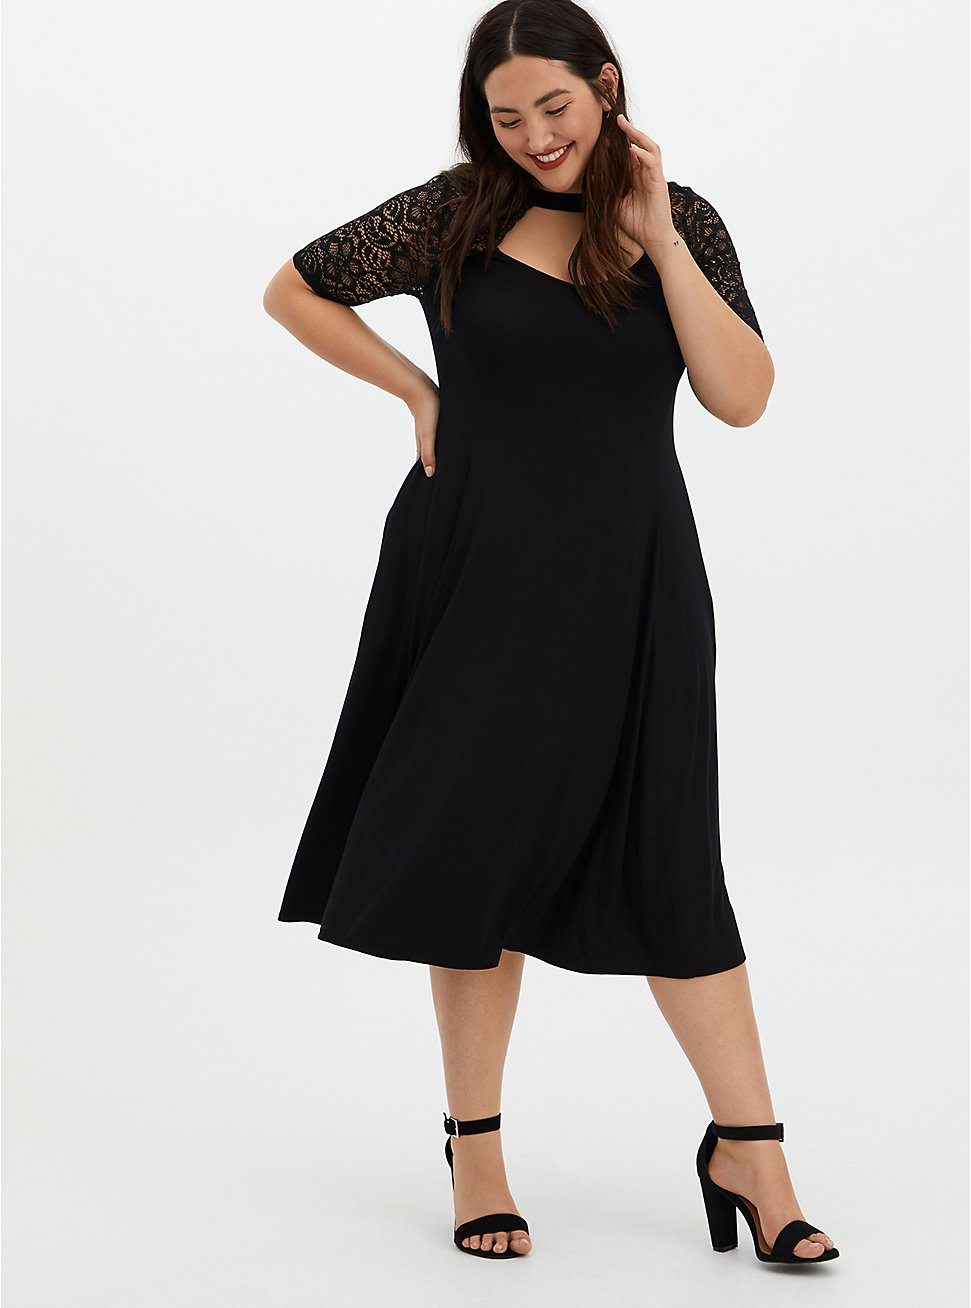 Plus Size Super Soft Black Lace Sleeve Midi Dress, DEEP BLACK, hi-res